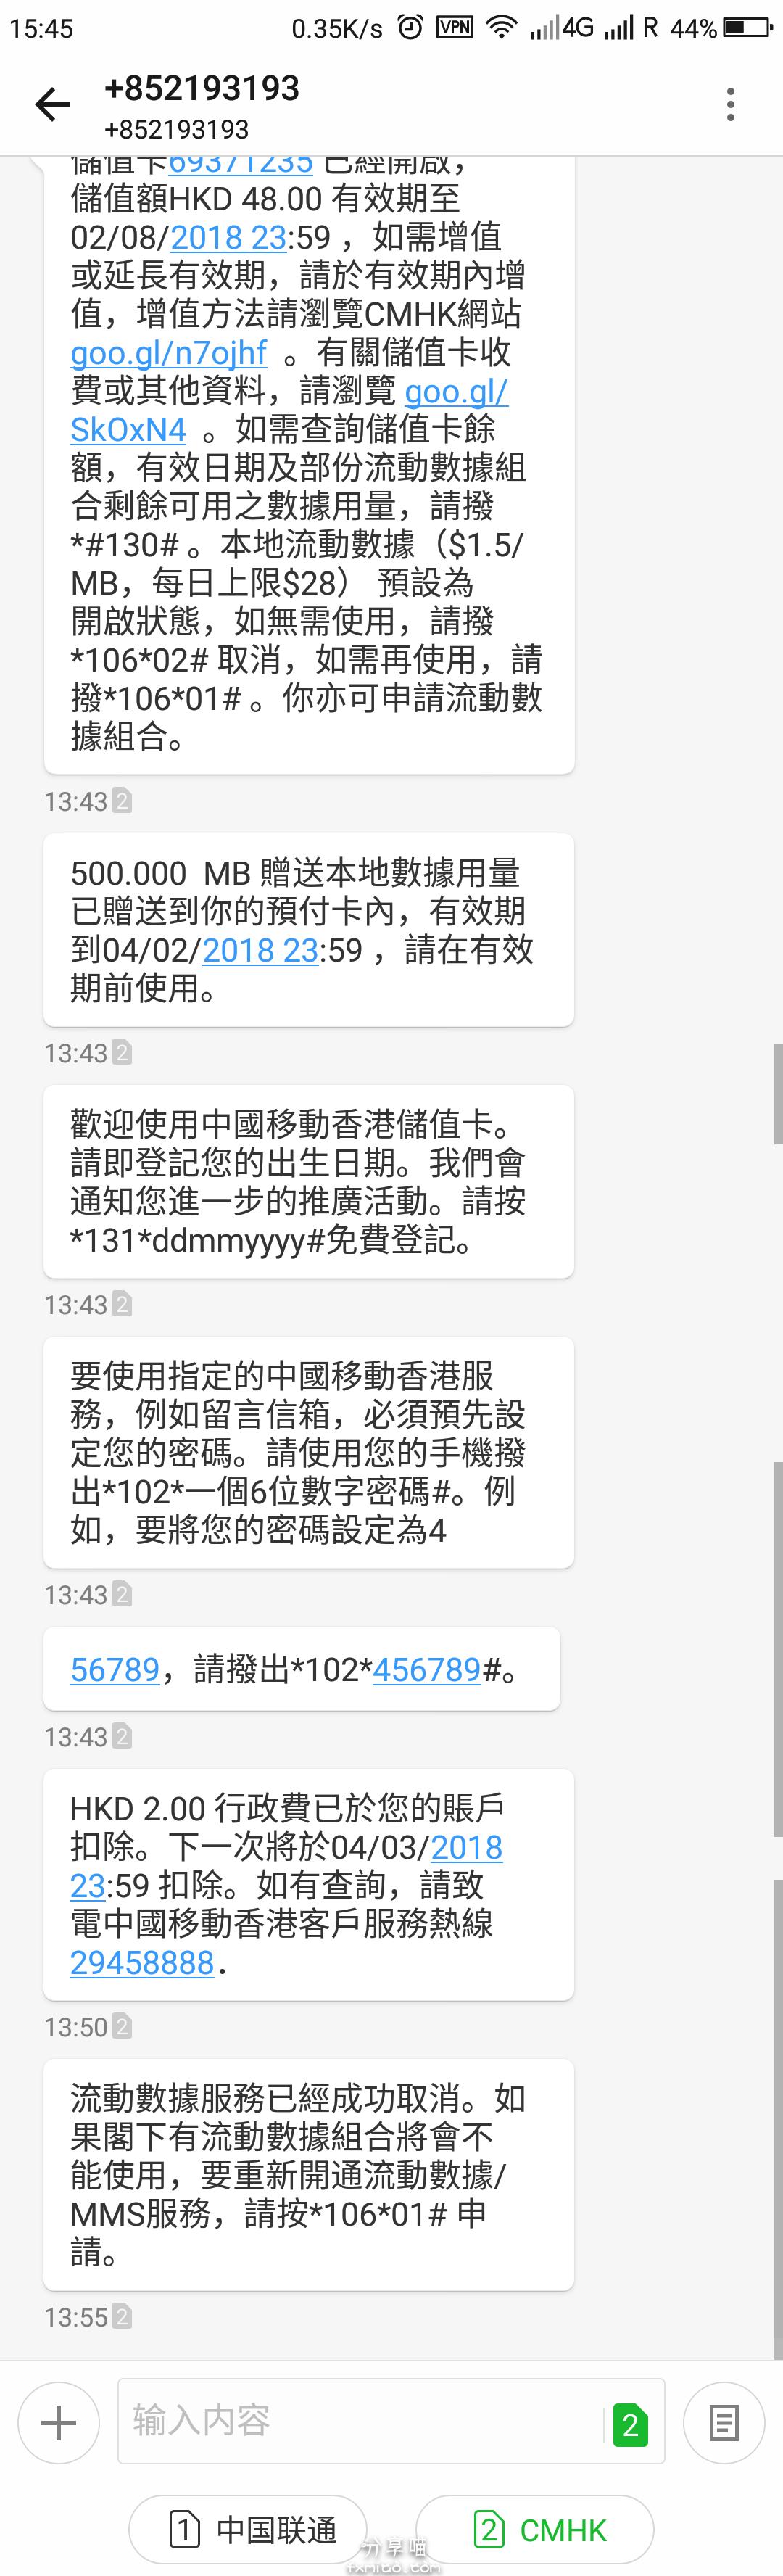 TIM图片20180203154639 - 用香港手机号注册阿里云国际版,获取300美金注册金